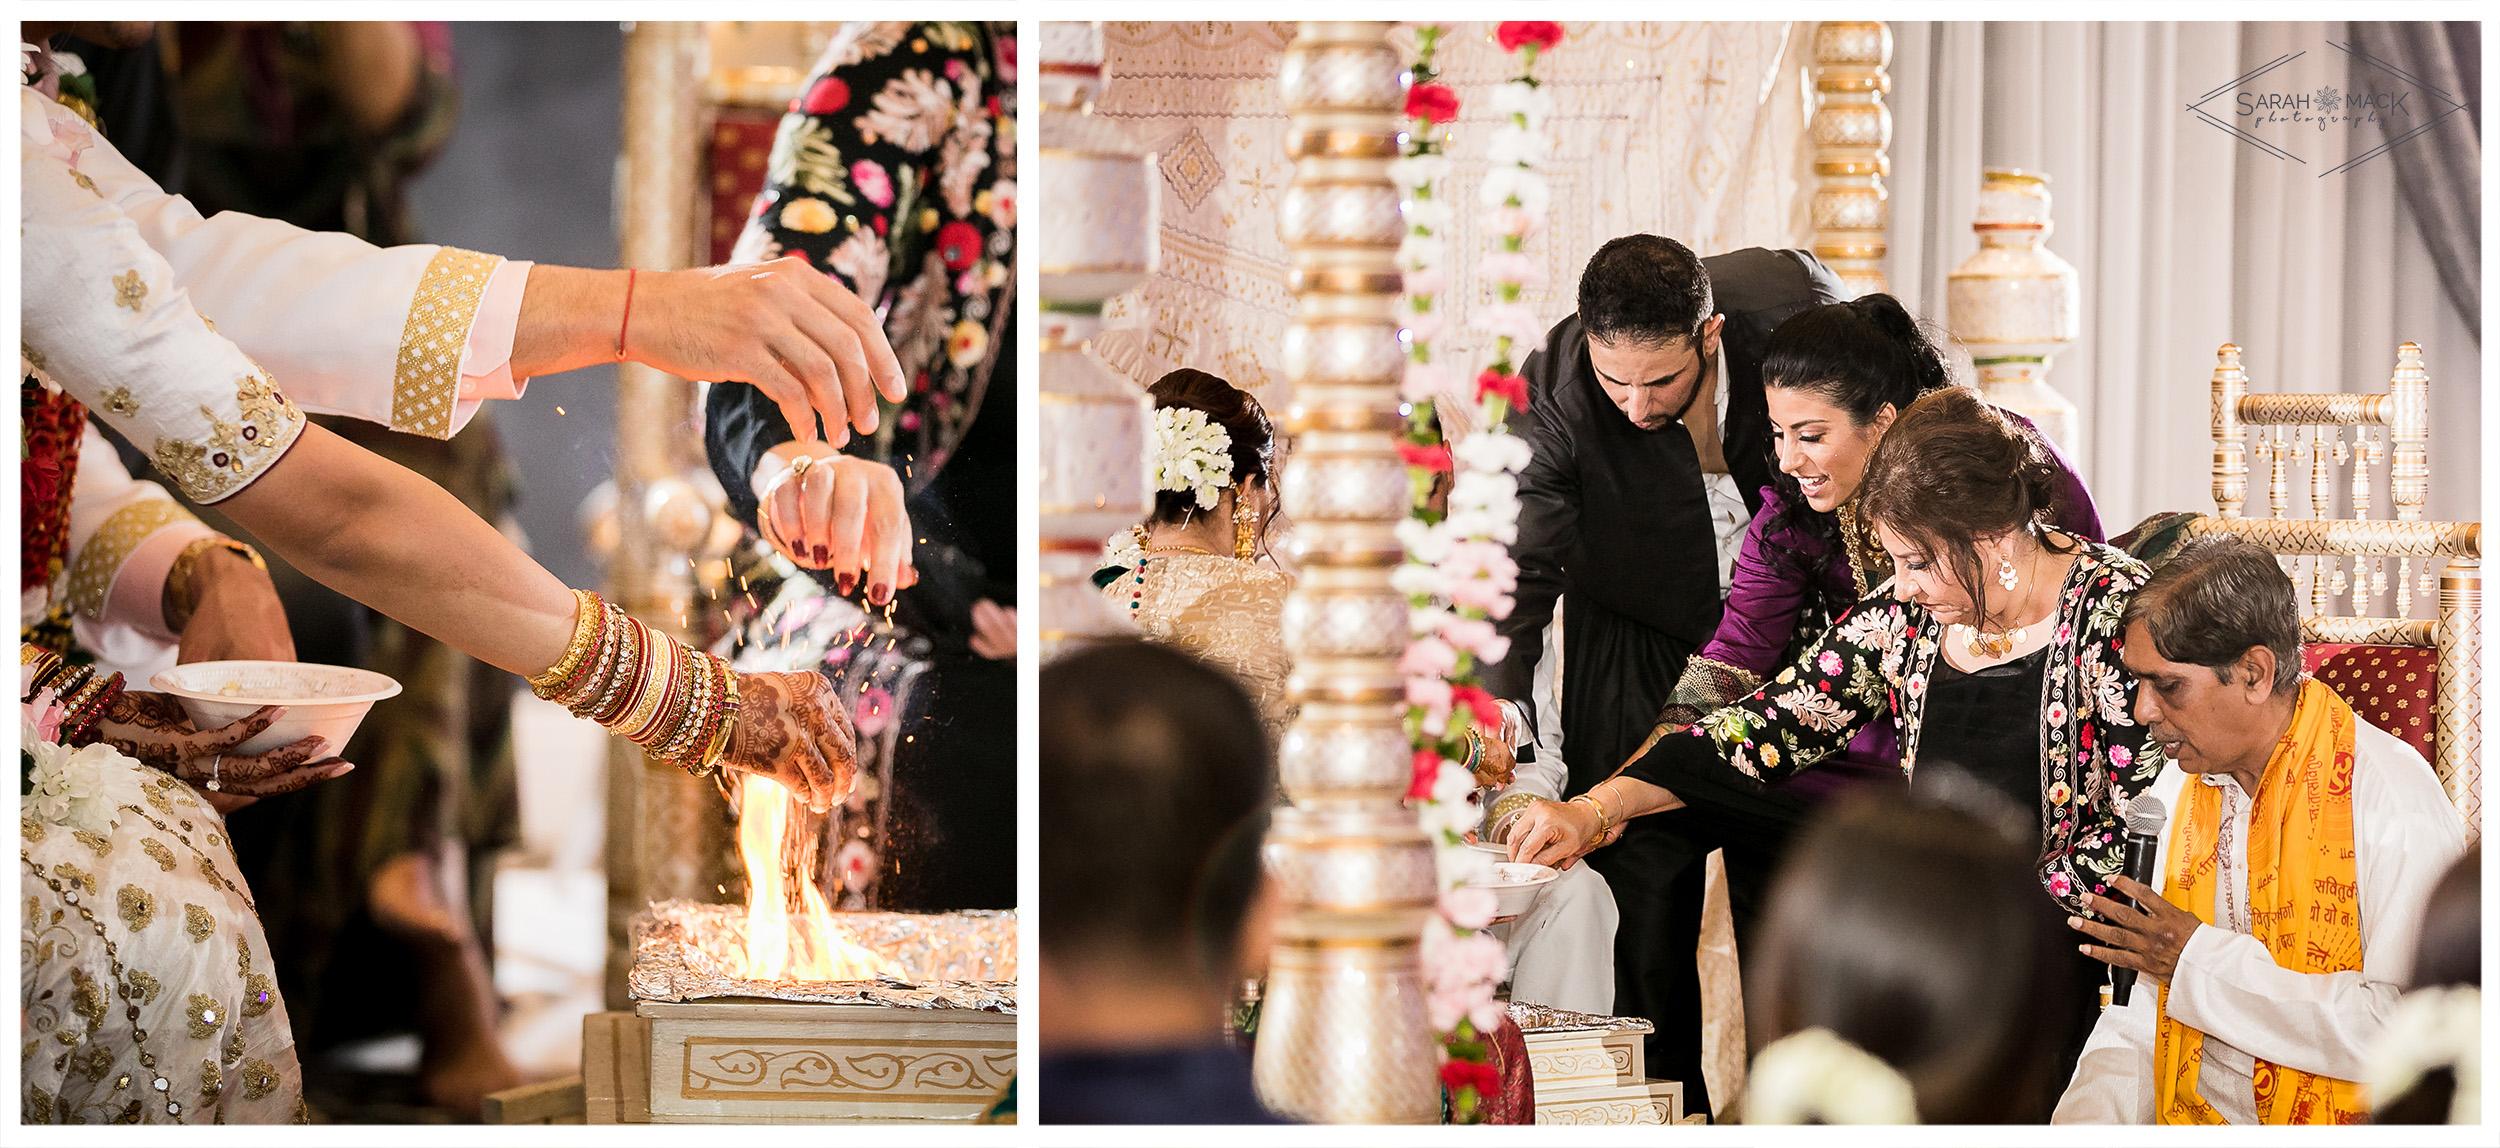 SE-Bella-Blanca-Event-Center-Burbank-Wedding-Photography-32.jpg